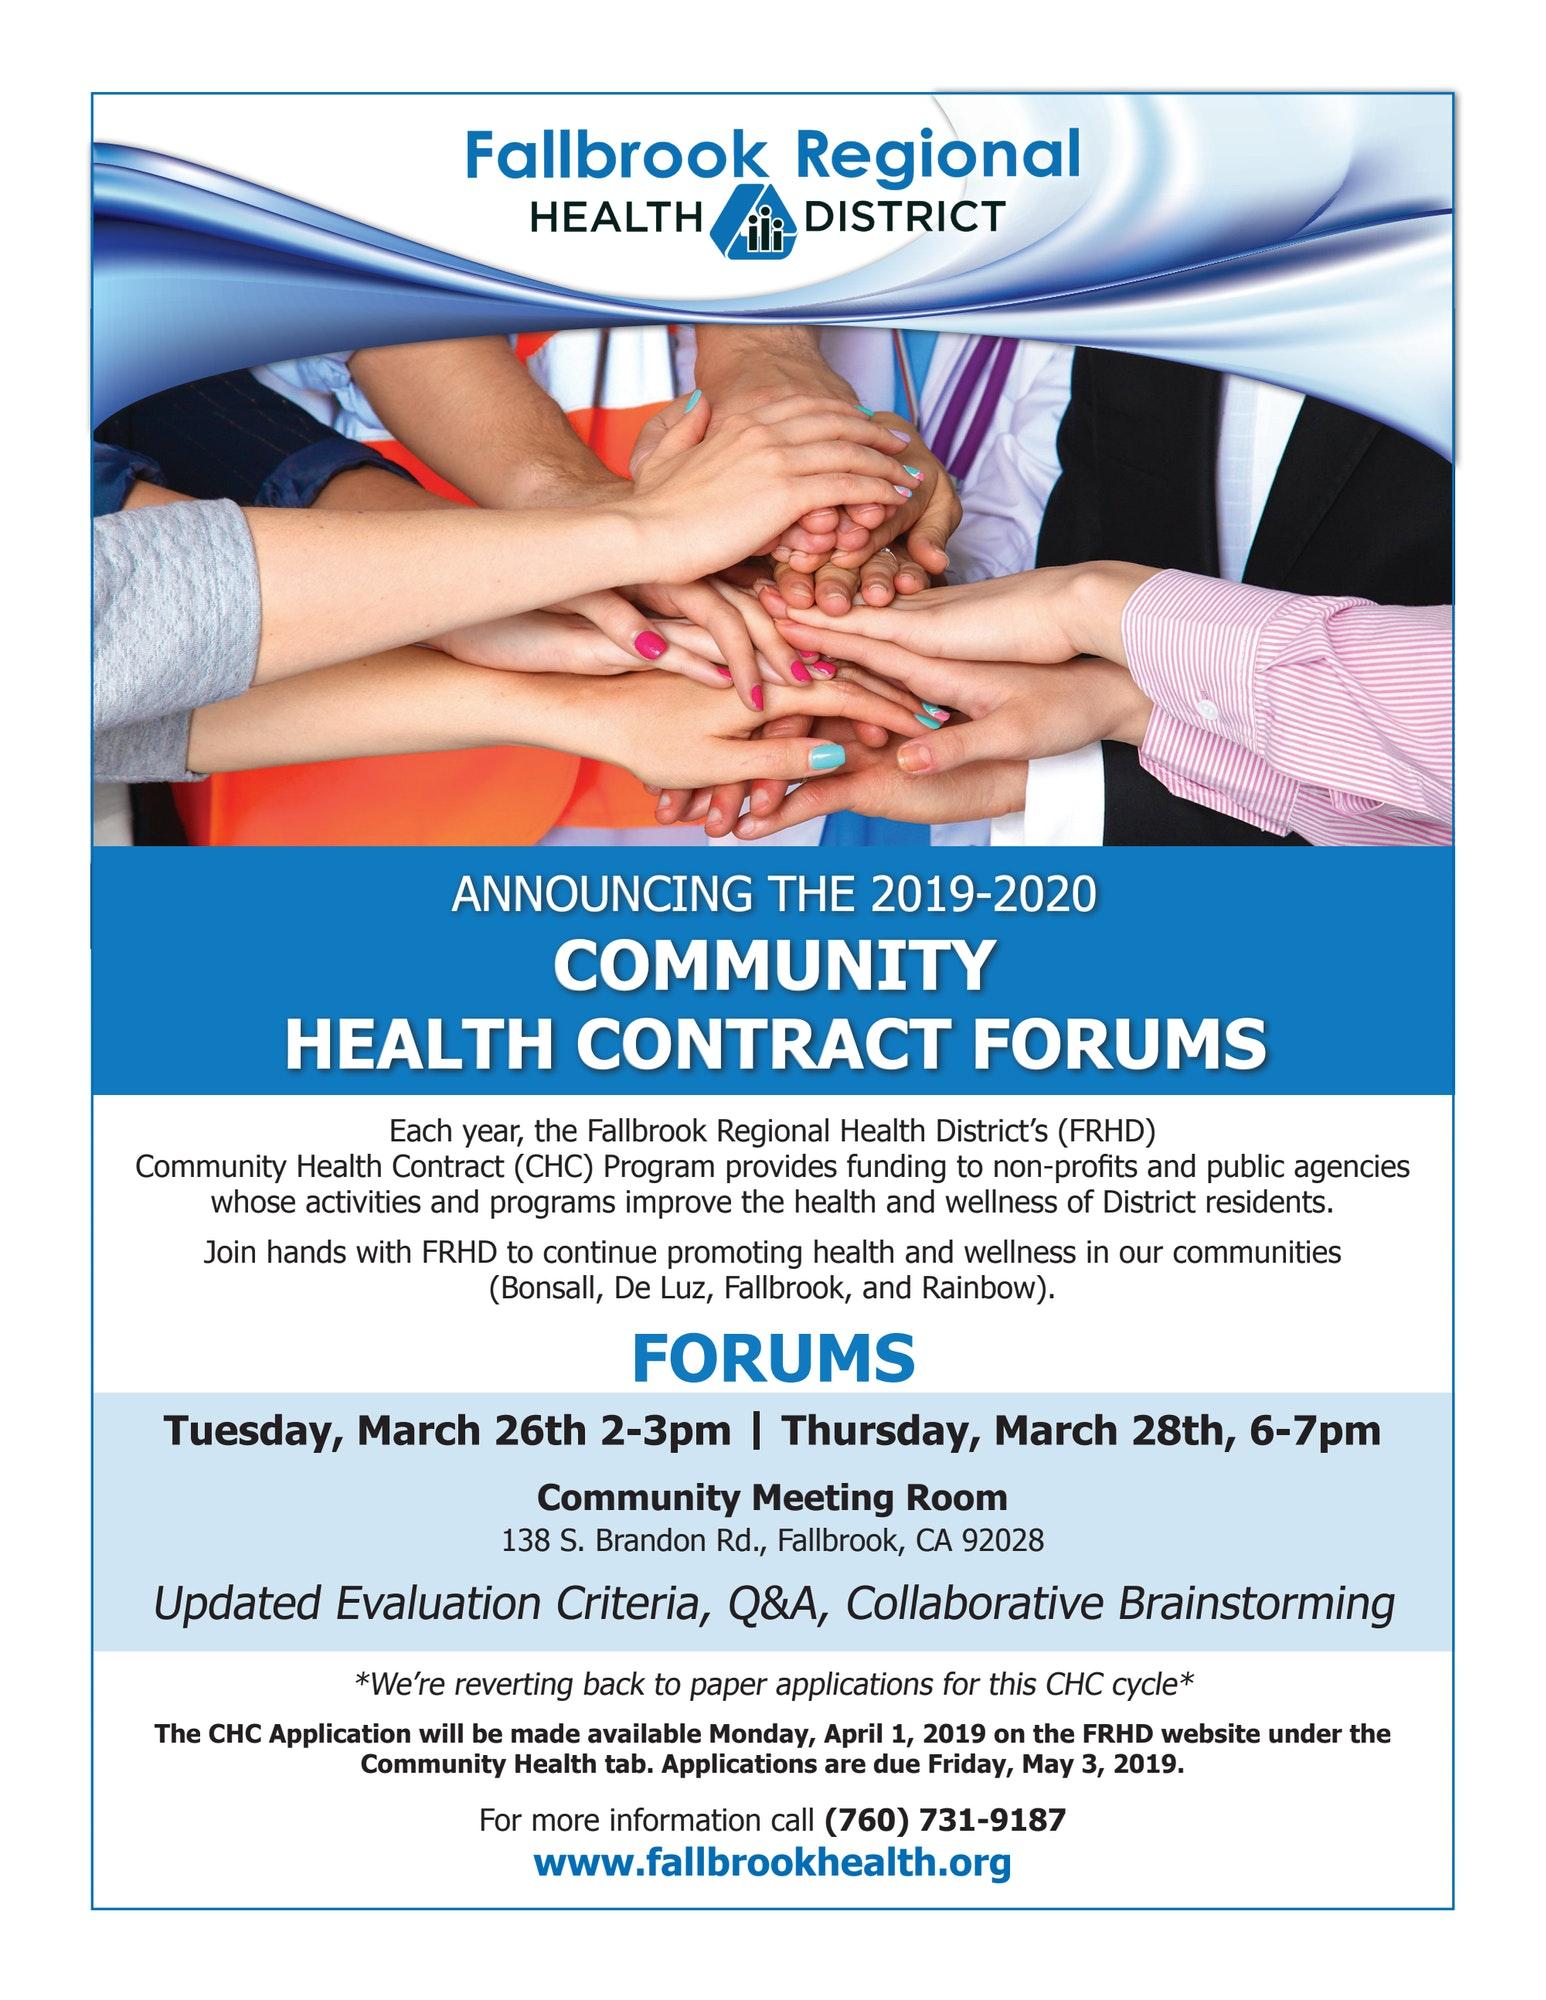 2019-2020 Fallbrook Regional Health District Community